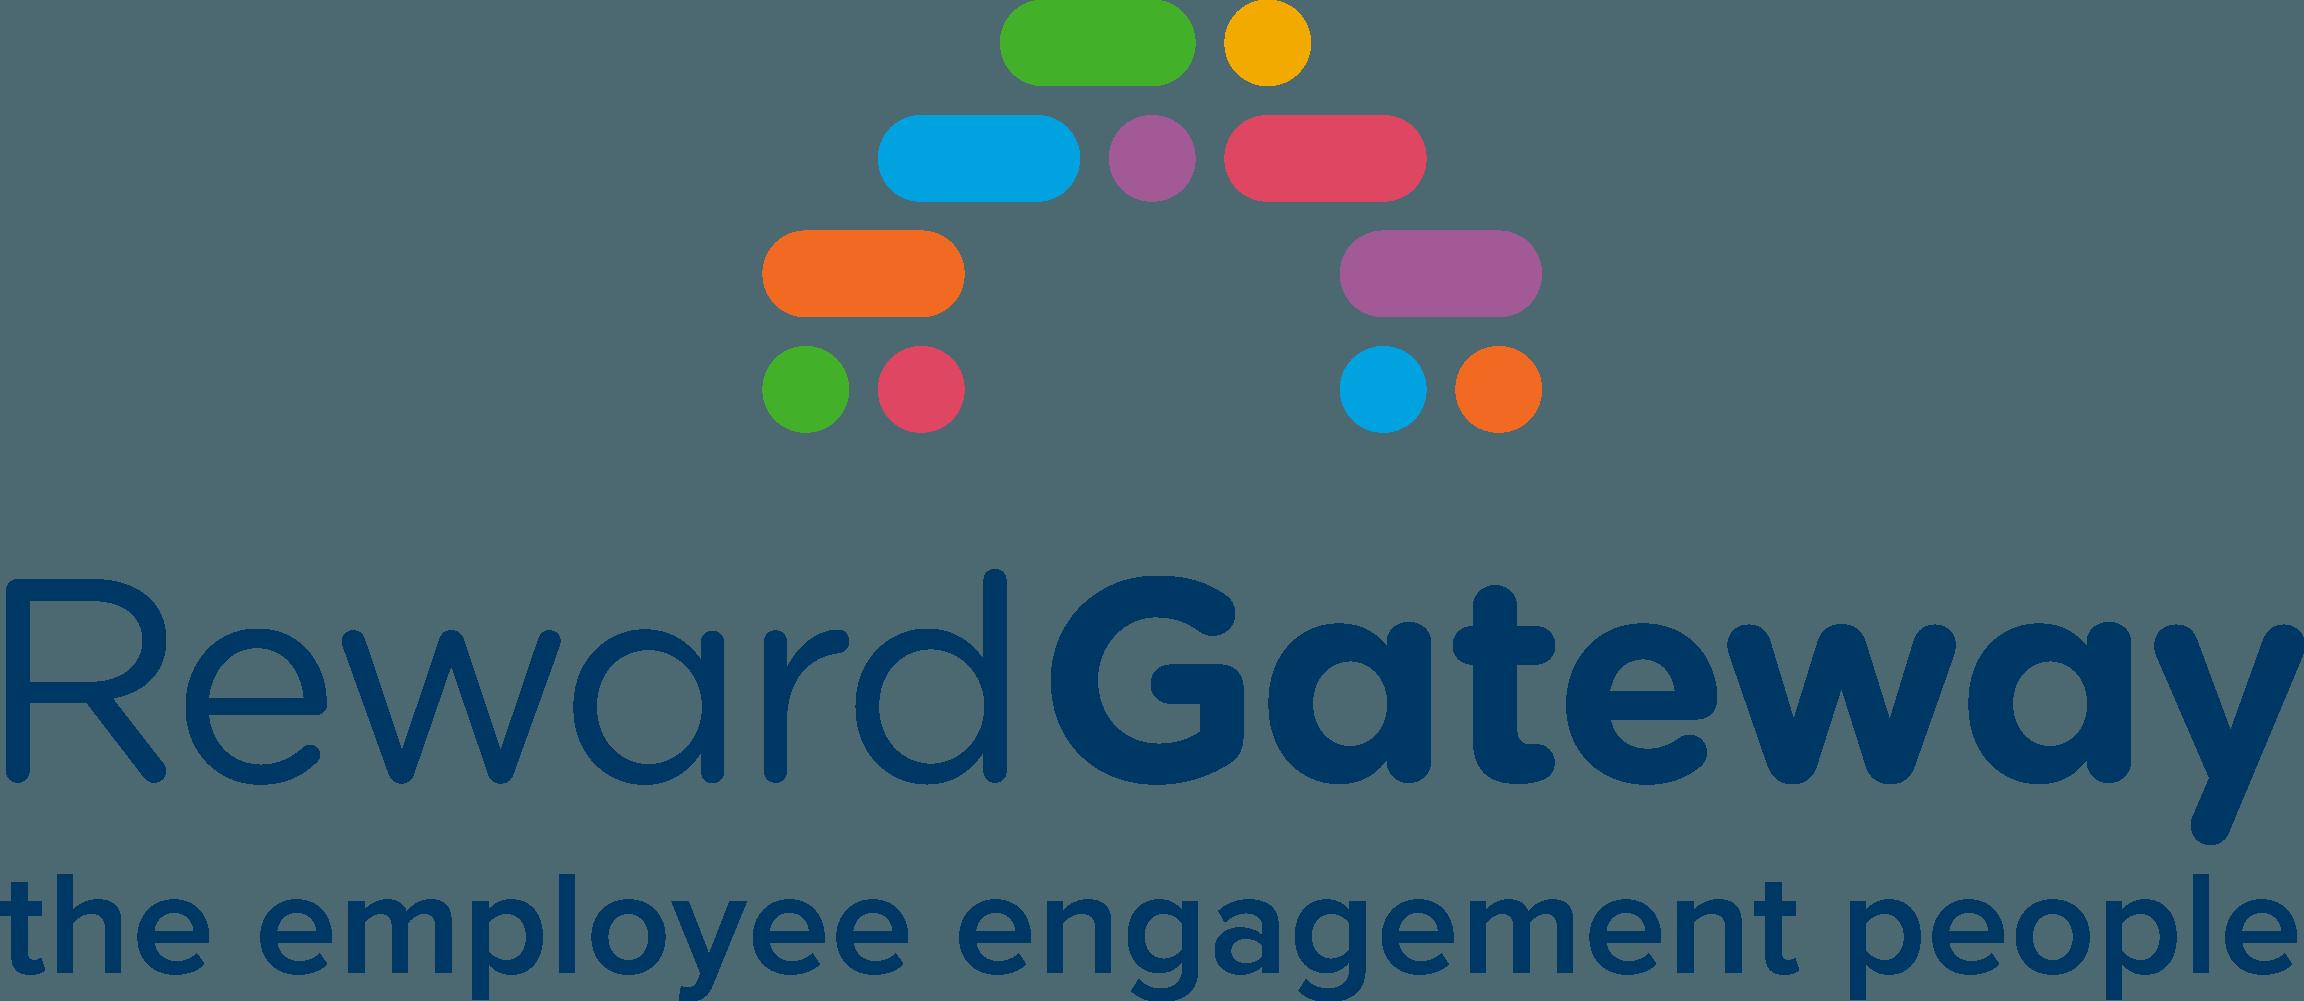 Reward_Gateway_logo_main_on_light_bg.png